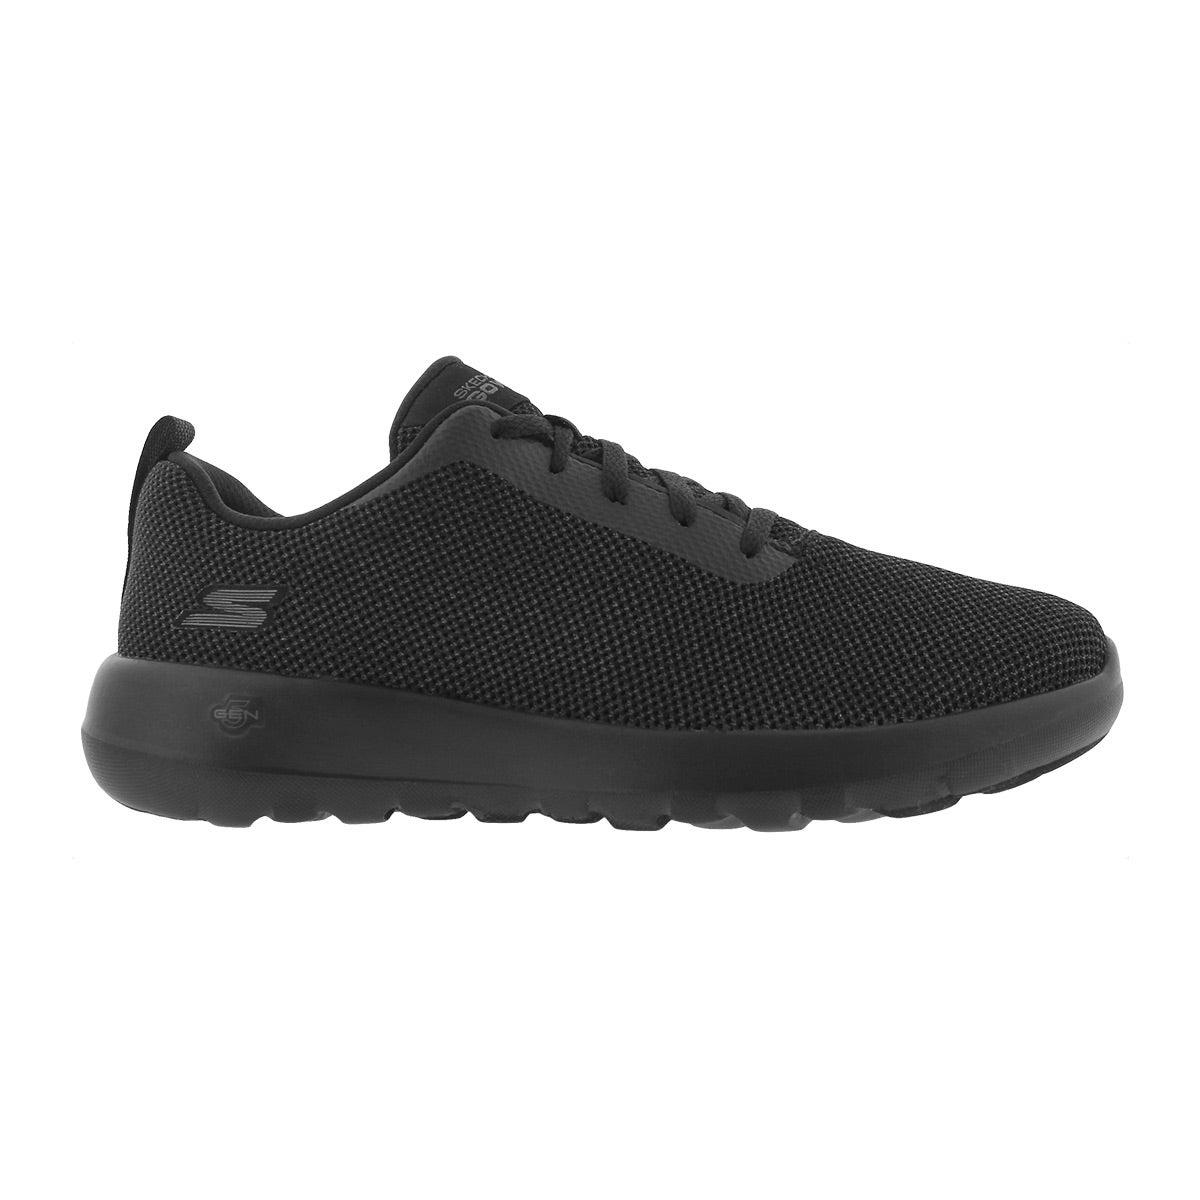 Lds GO Walk Joy blk lace up walking shoe